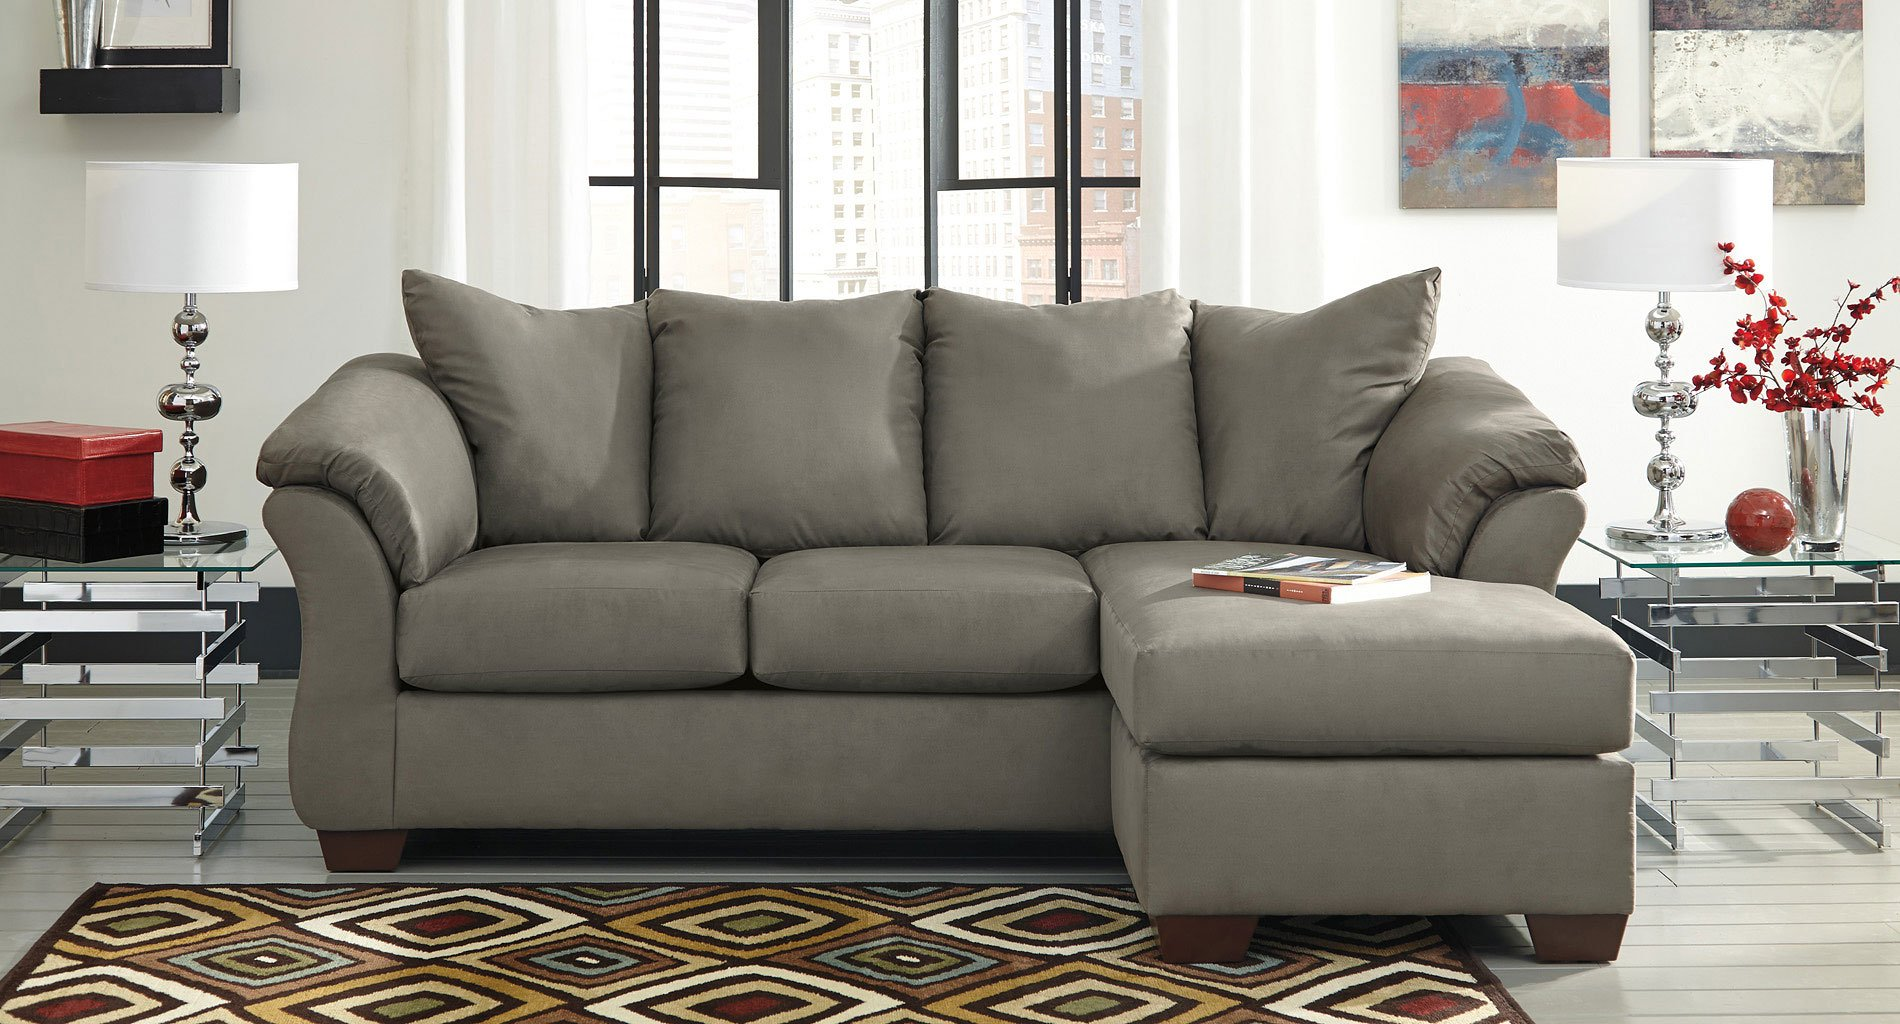 Darcy Cobblestone Sofa Chaise Set By Signature Design By